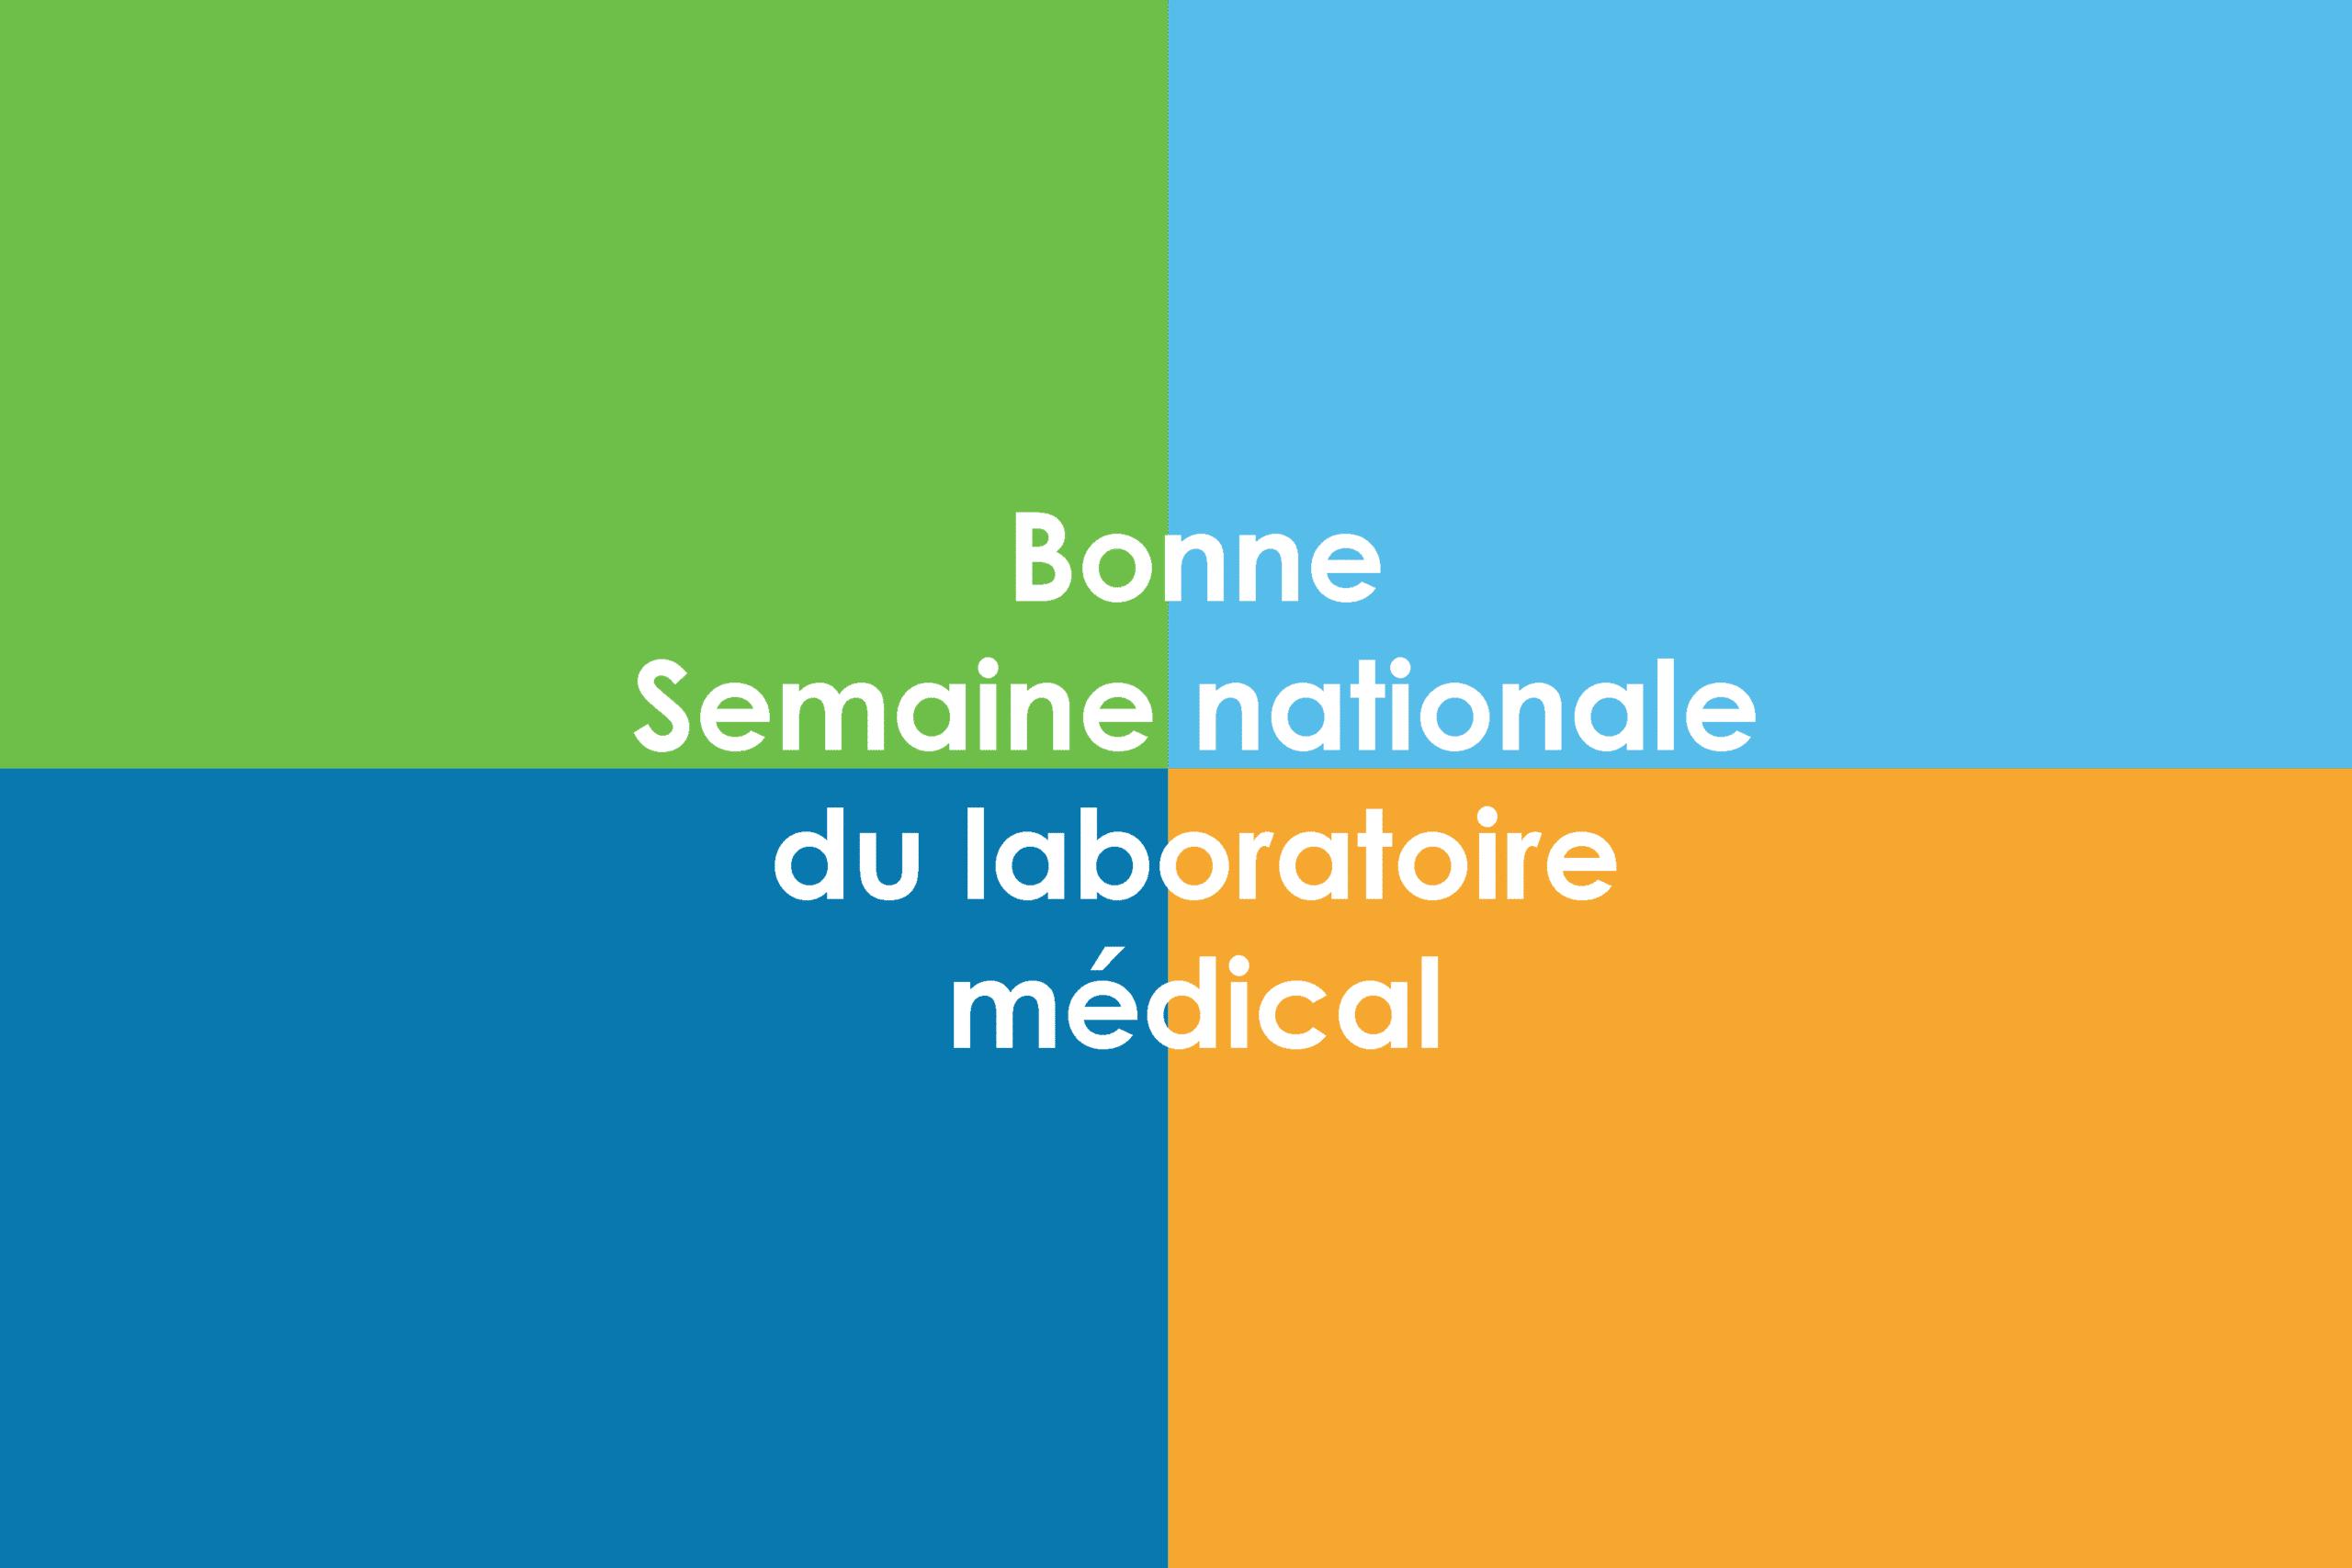 Bonee Semaine nationale de laboratoire medical